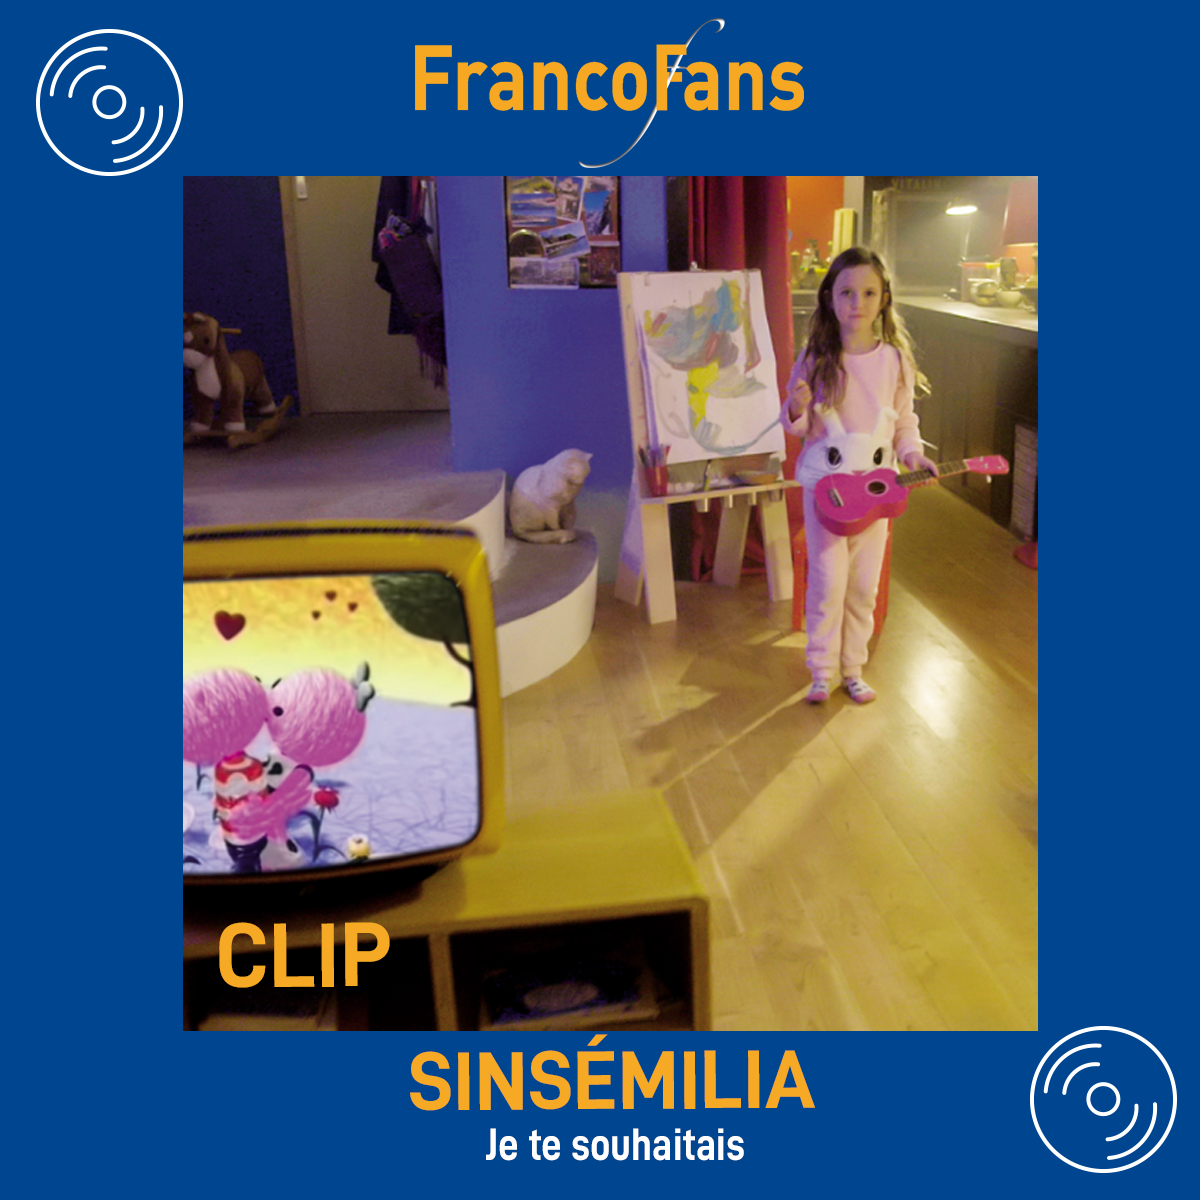 [Clip] Sinsemilia - Je te souhaitais